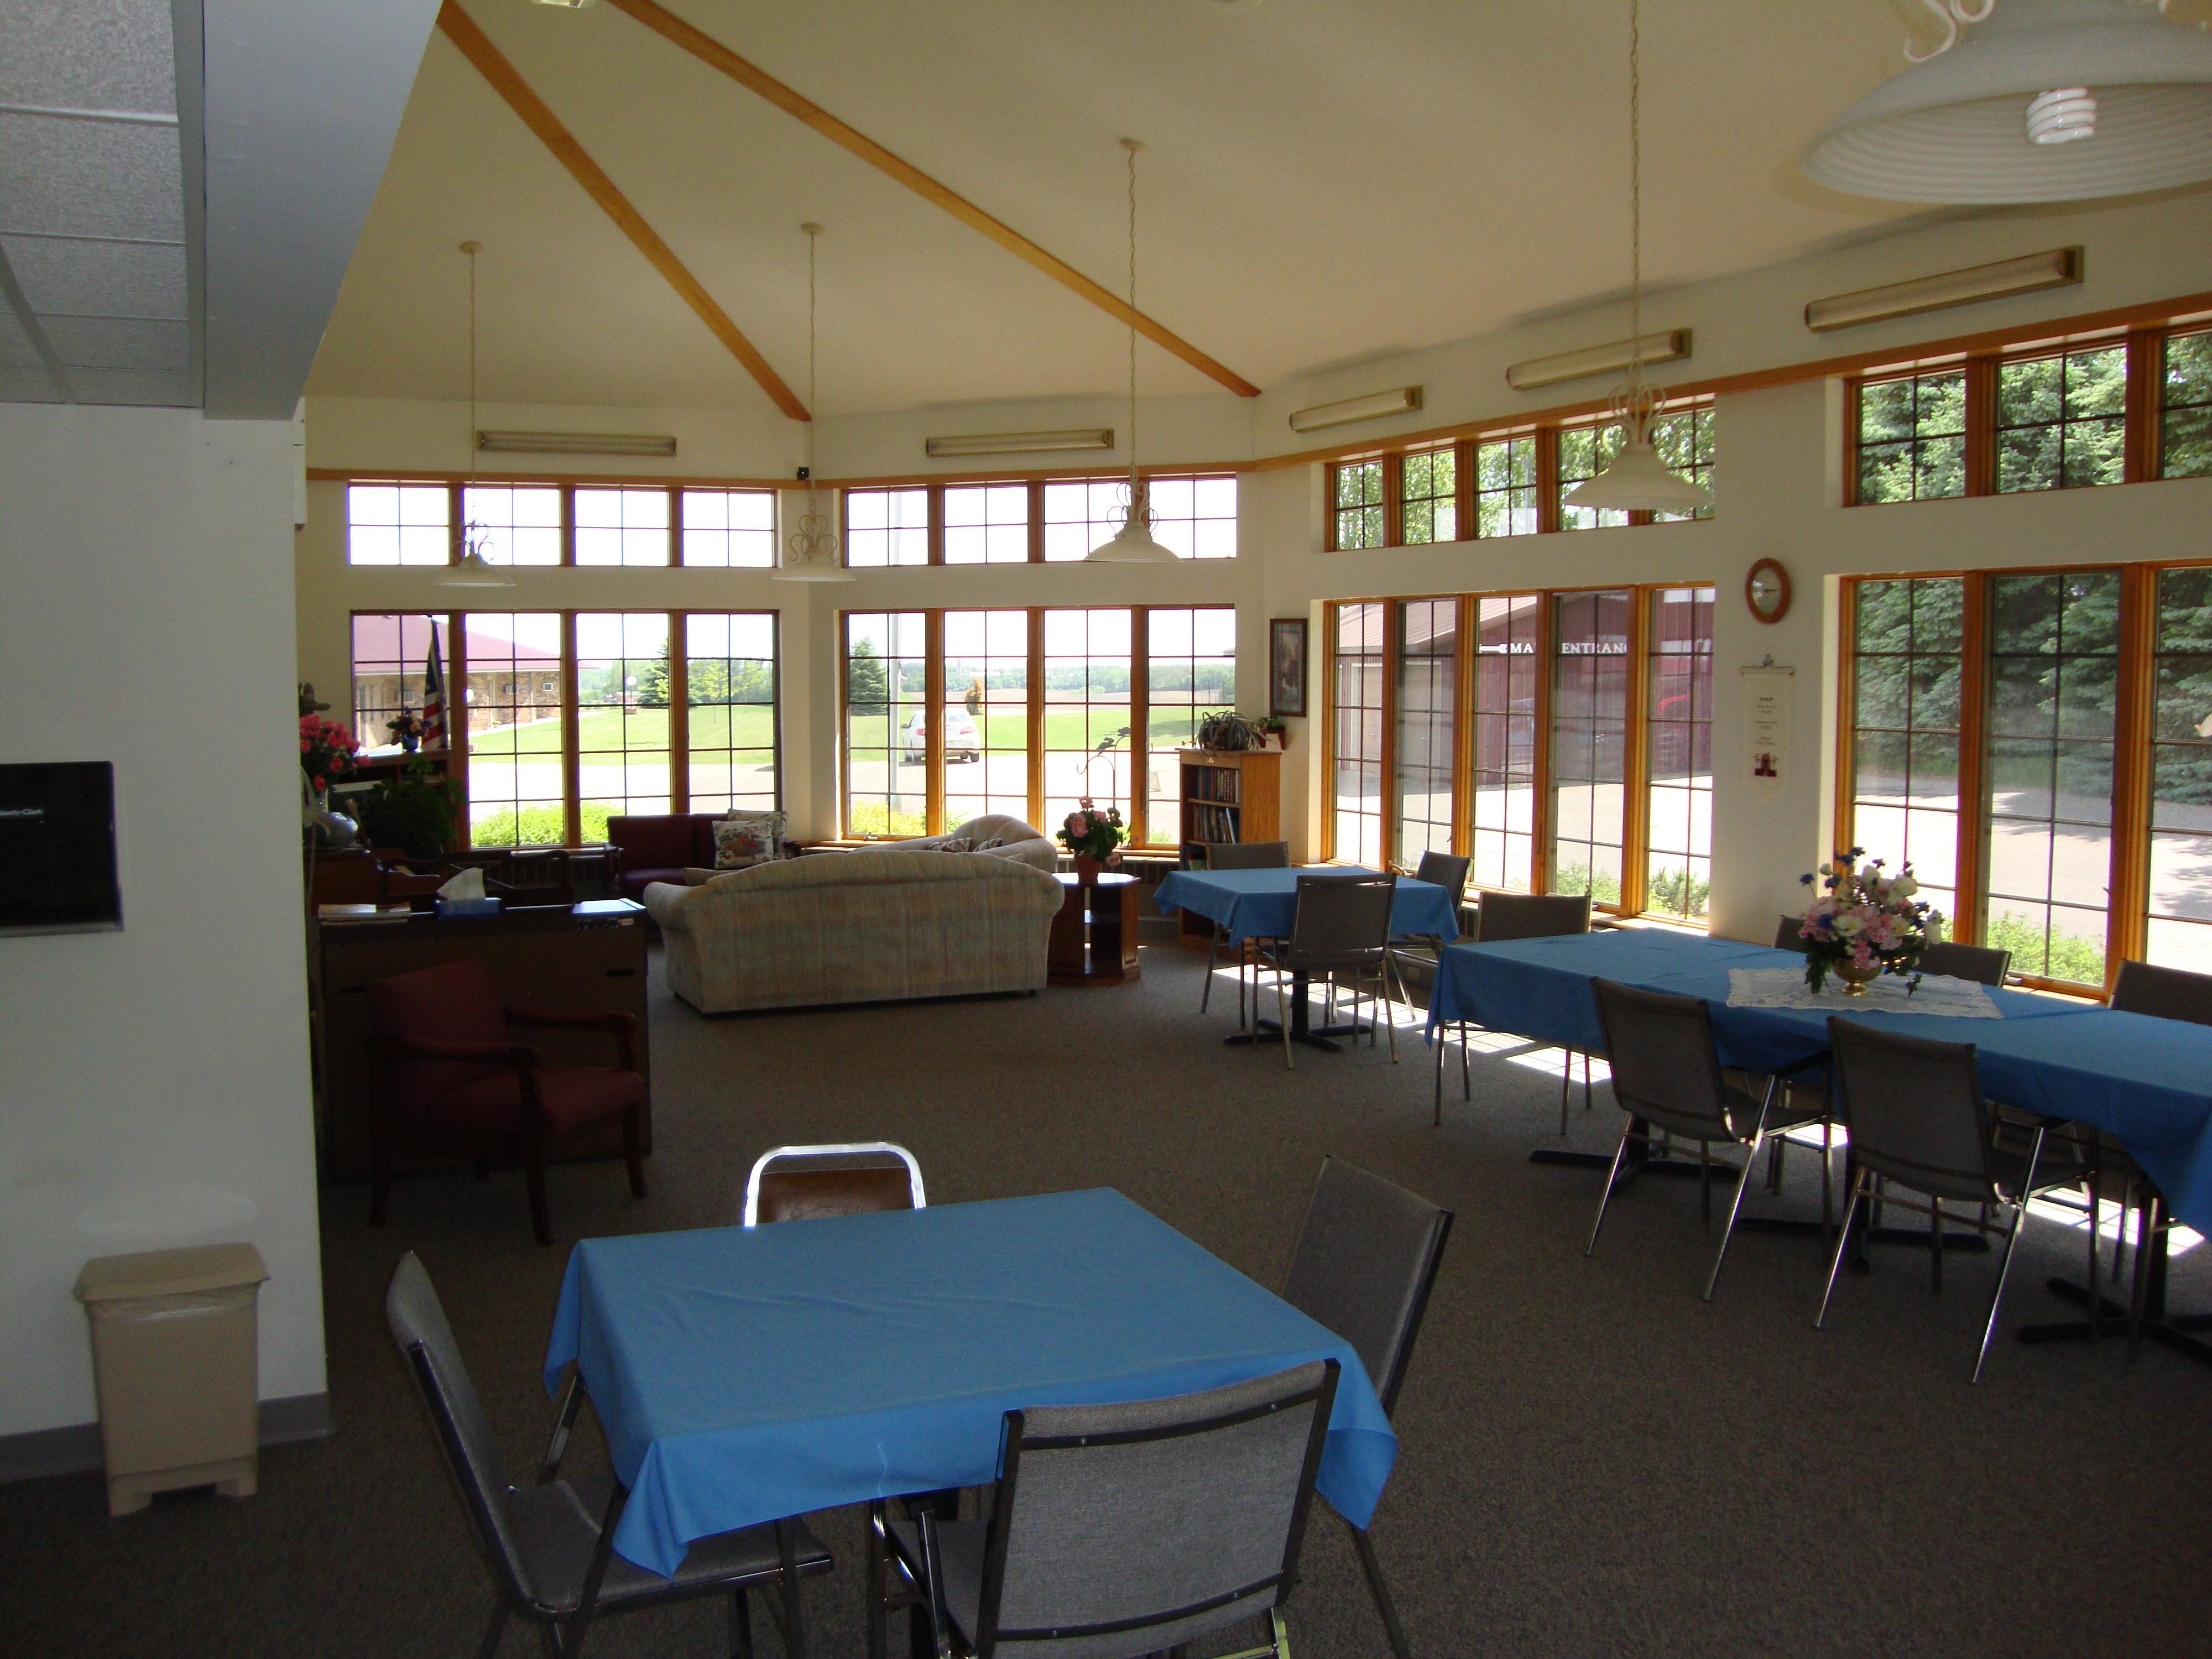 Evansville Care Campus - Sunset Room